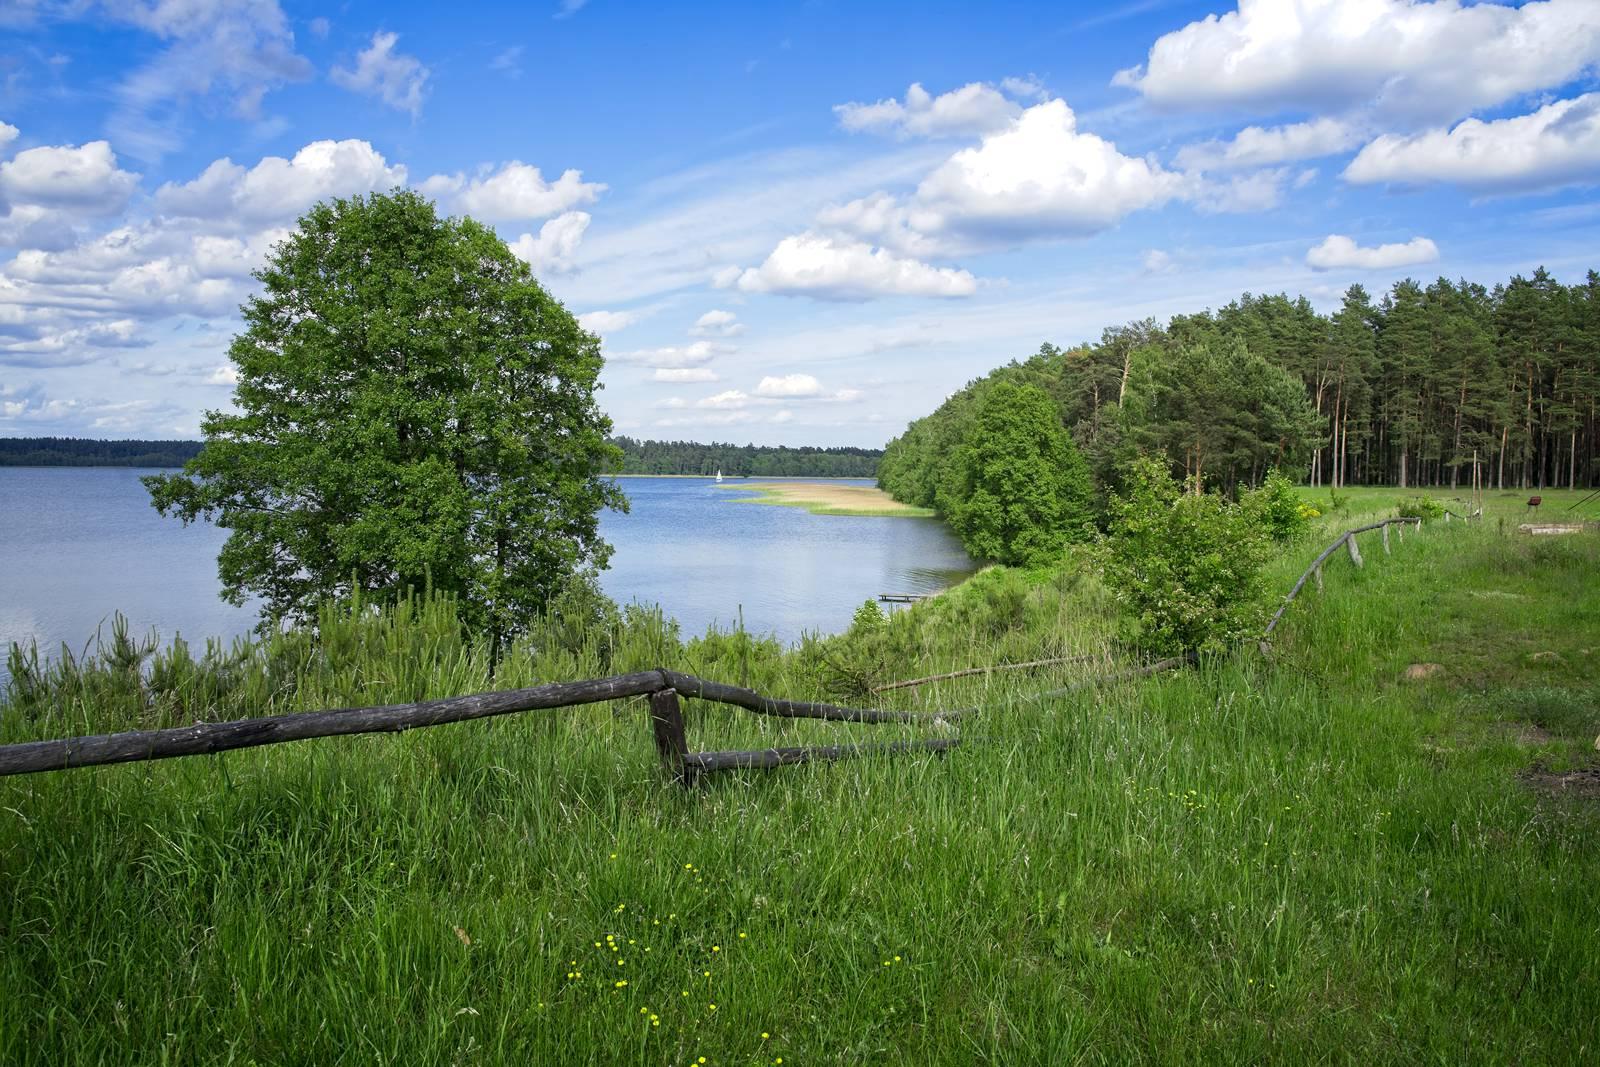 mazury karwica camping na dziko jezioro nidzkie